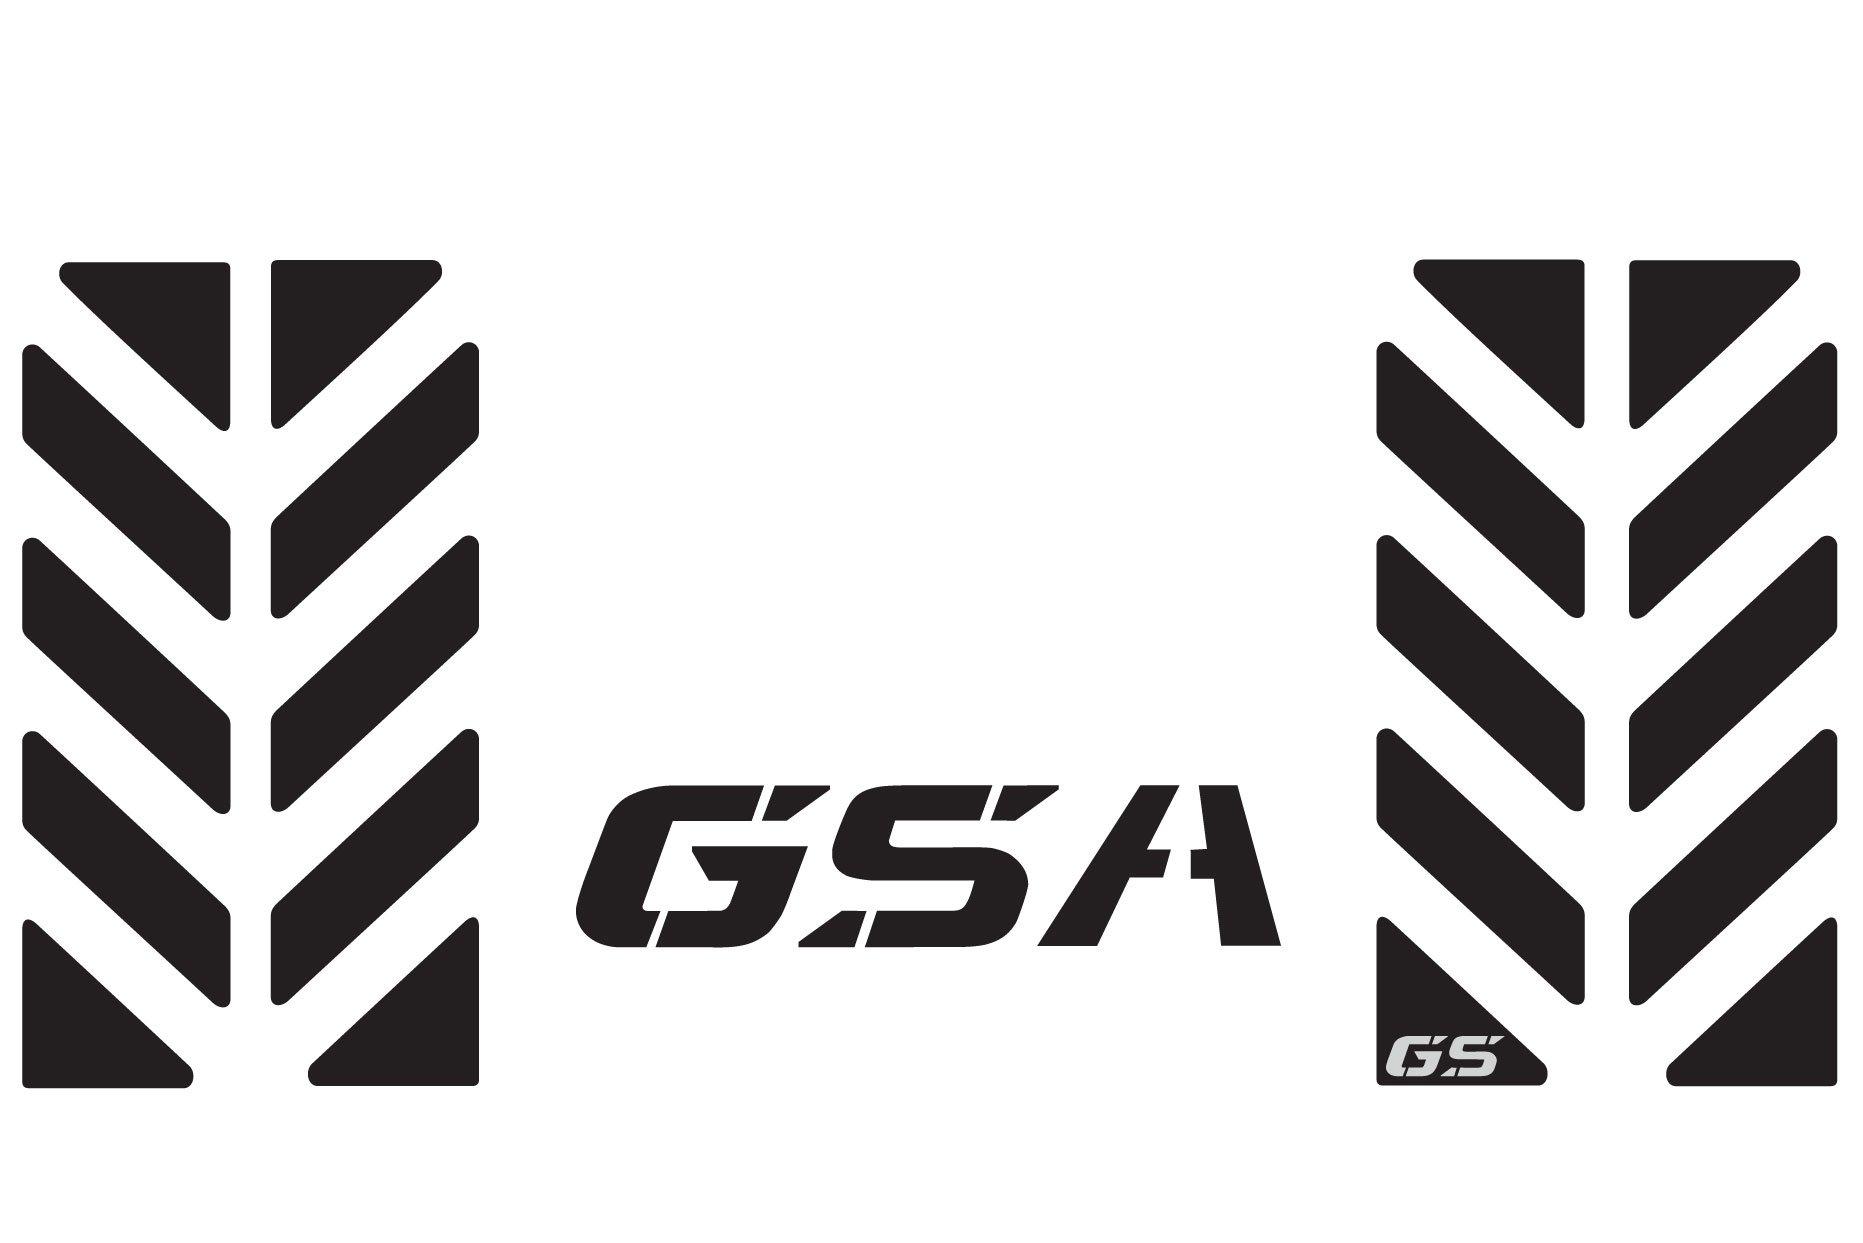 The Pixel Hut gs00018b BMW GS Motorcycle Reflective Decal Kit ''GSA Chevron'' for Touratech Top Case Box - Black